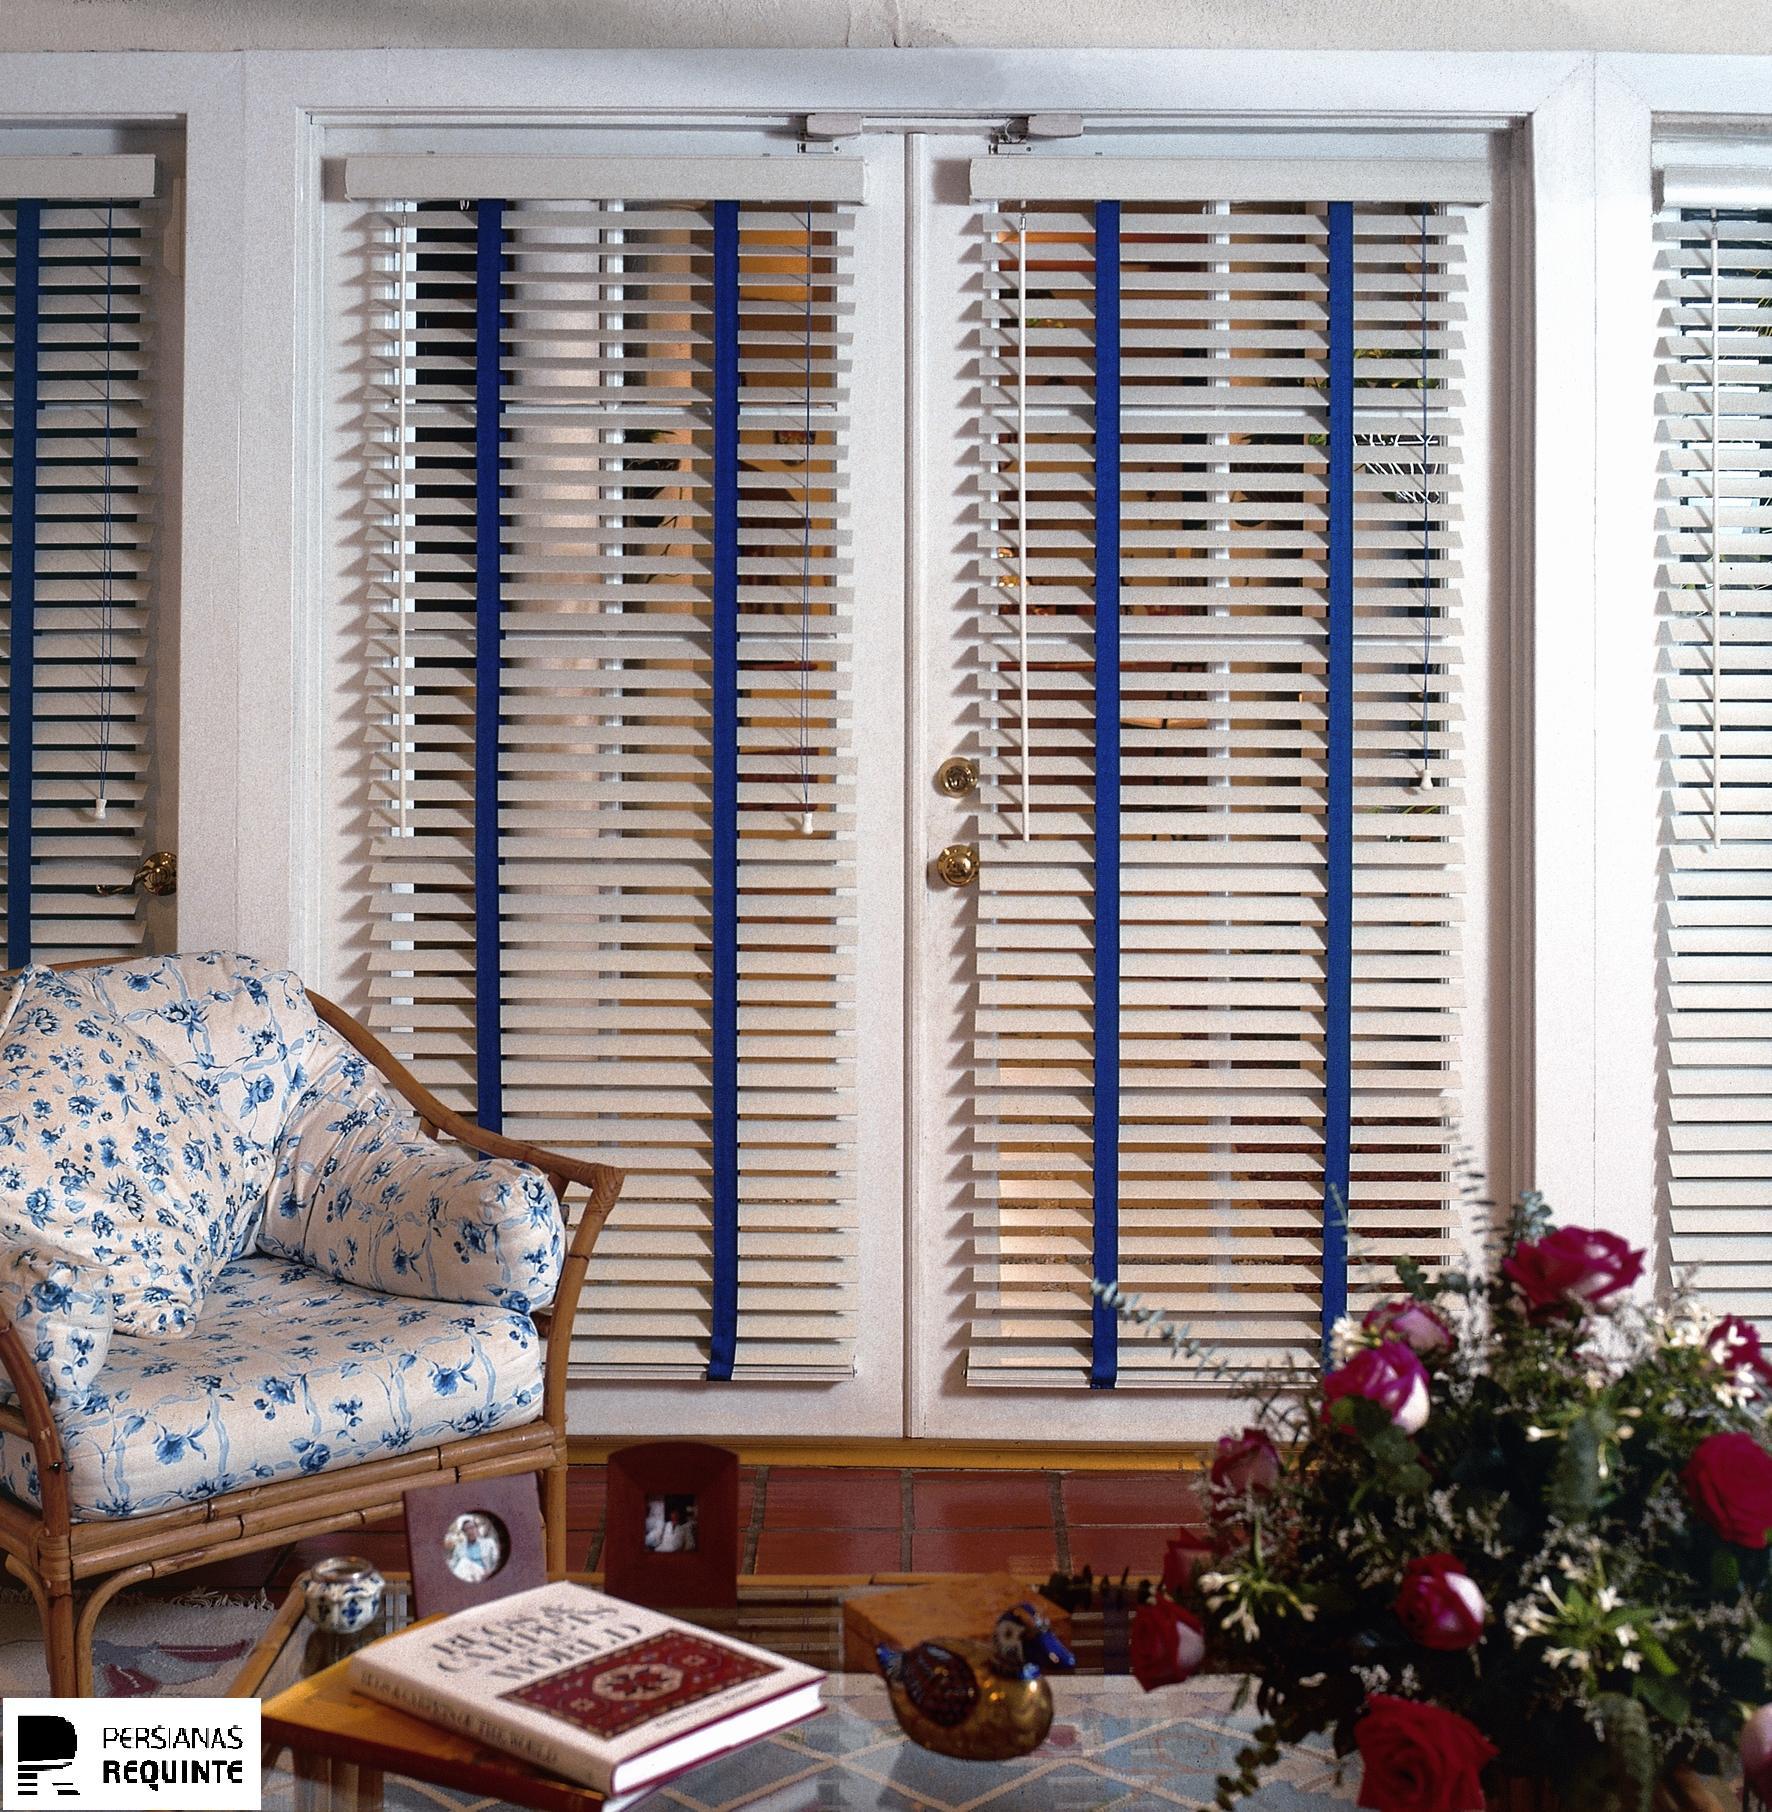 Persiana horizontal 50mm madeira natural persianas - Laminas de persianas ...